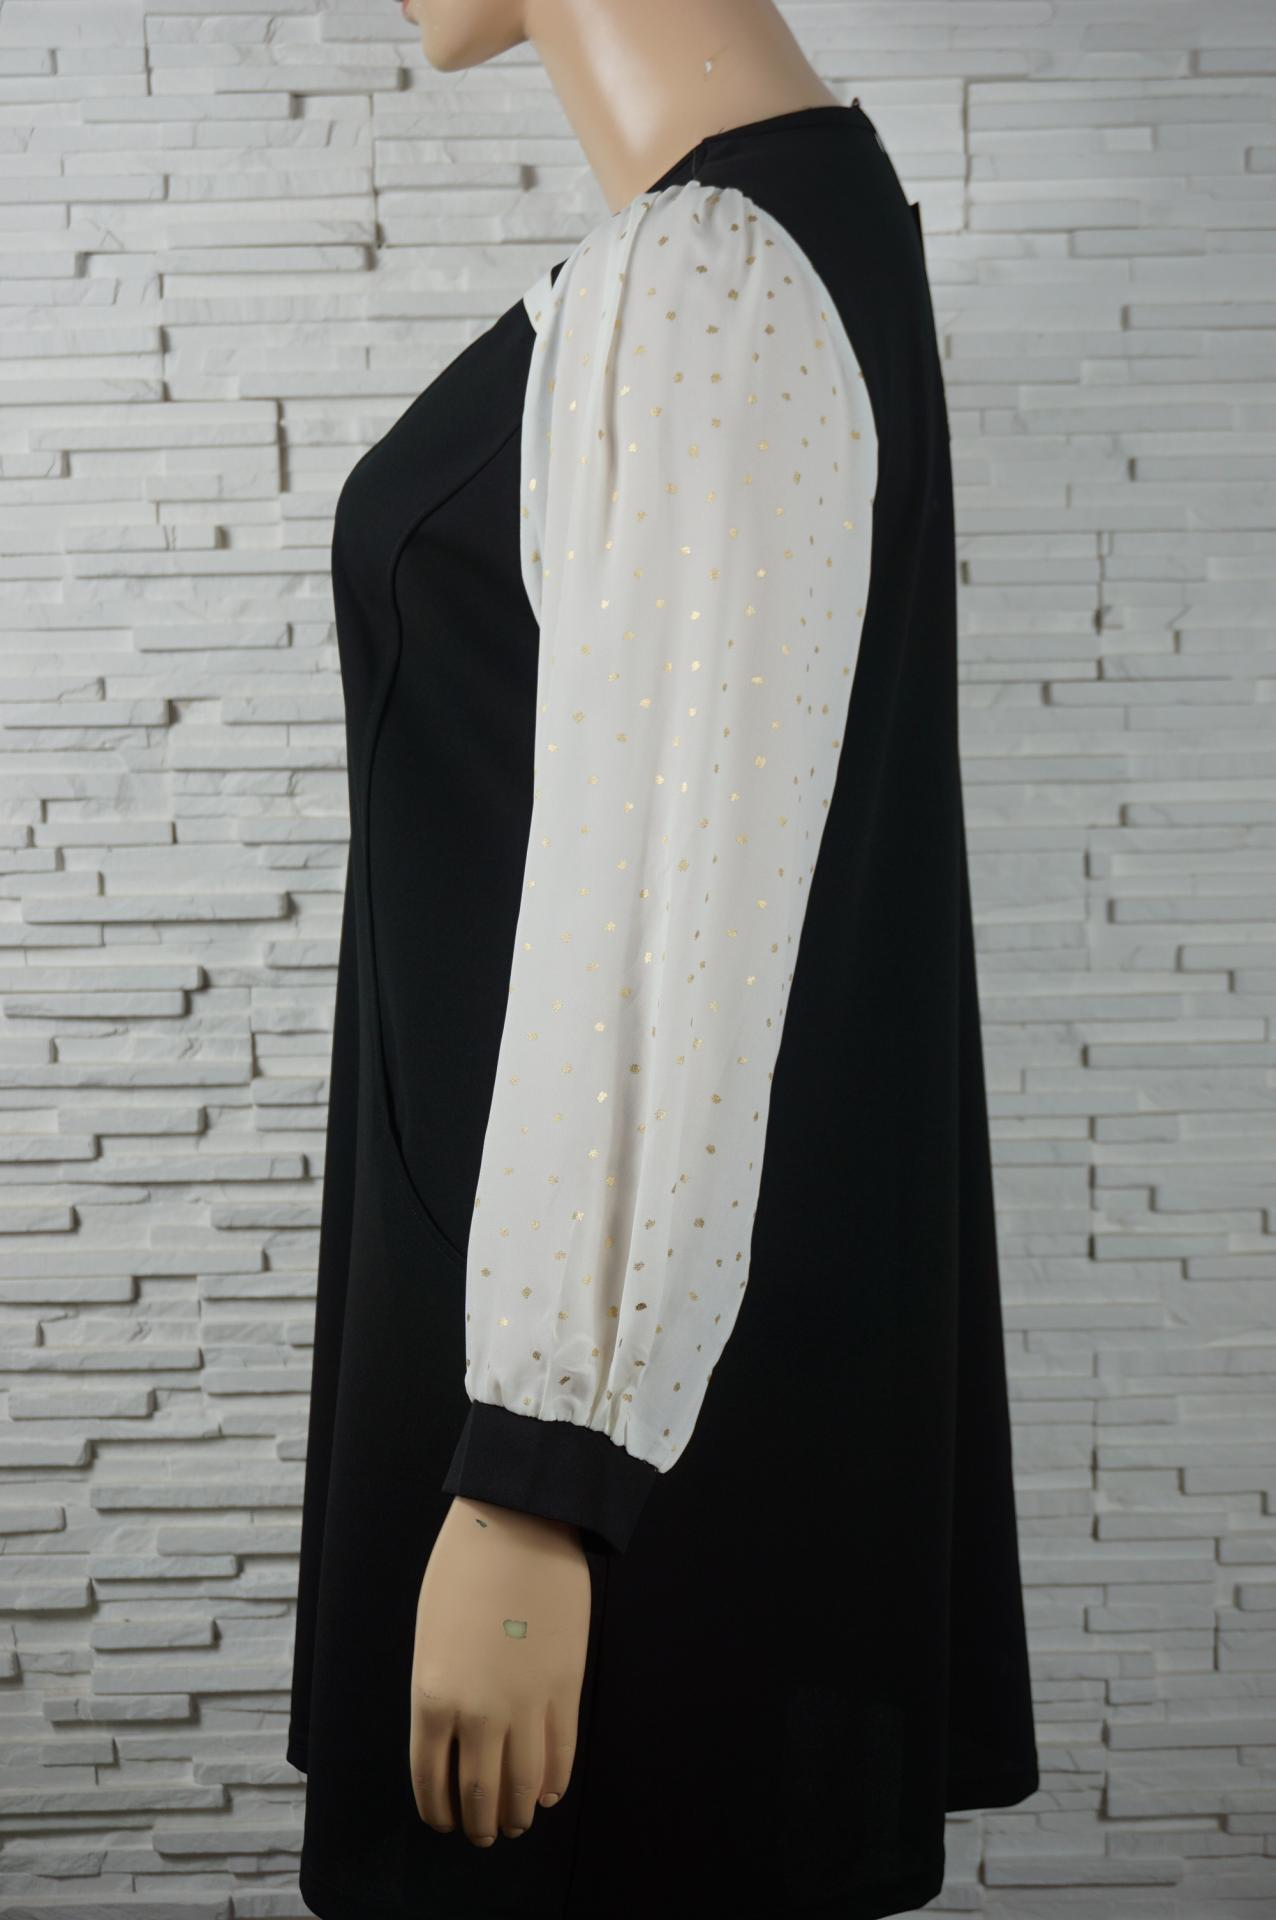 Robe vintage noir et blanc2